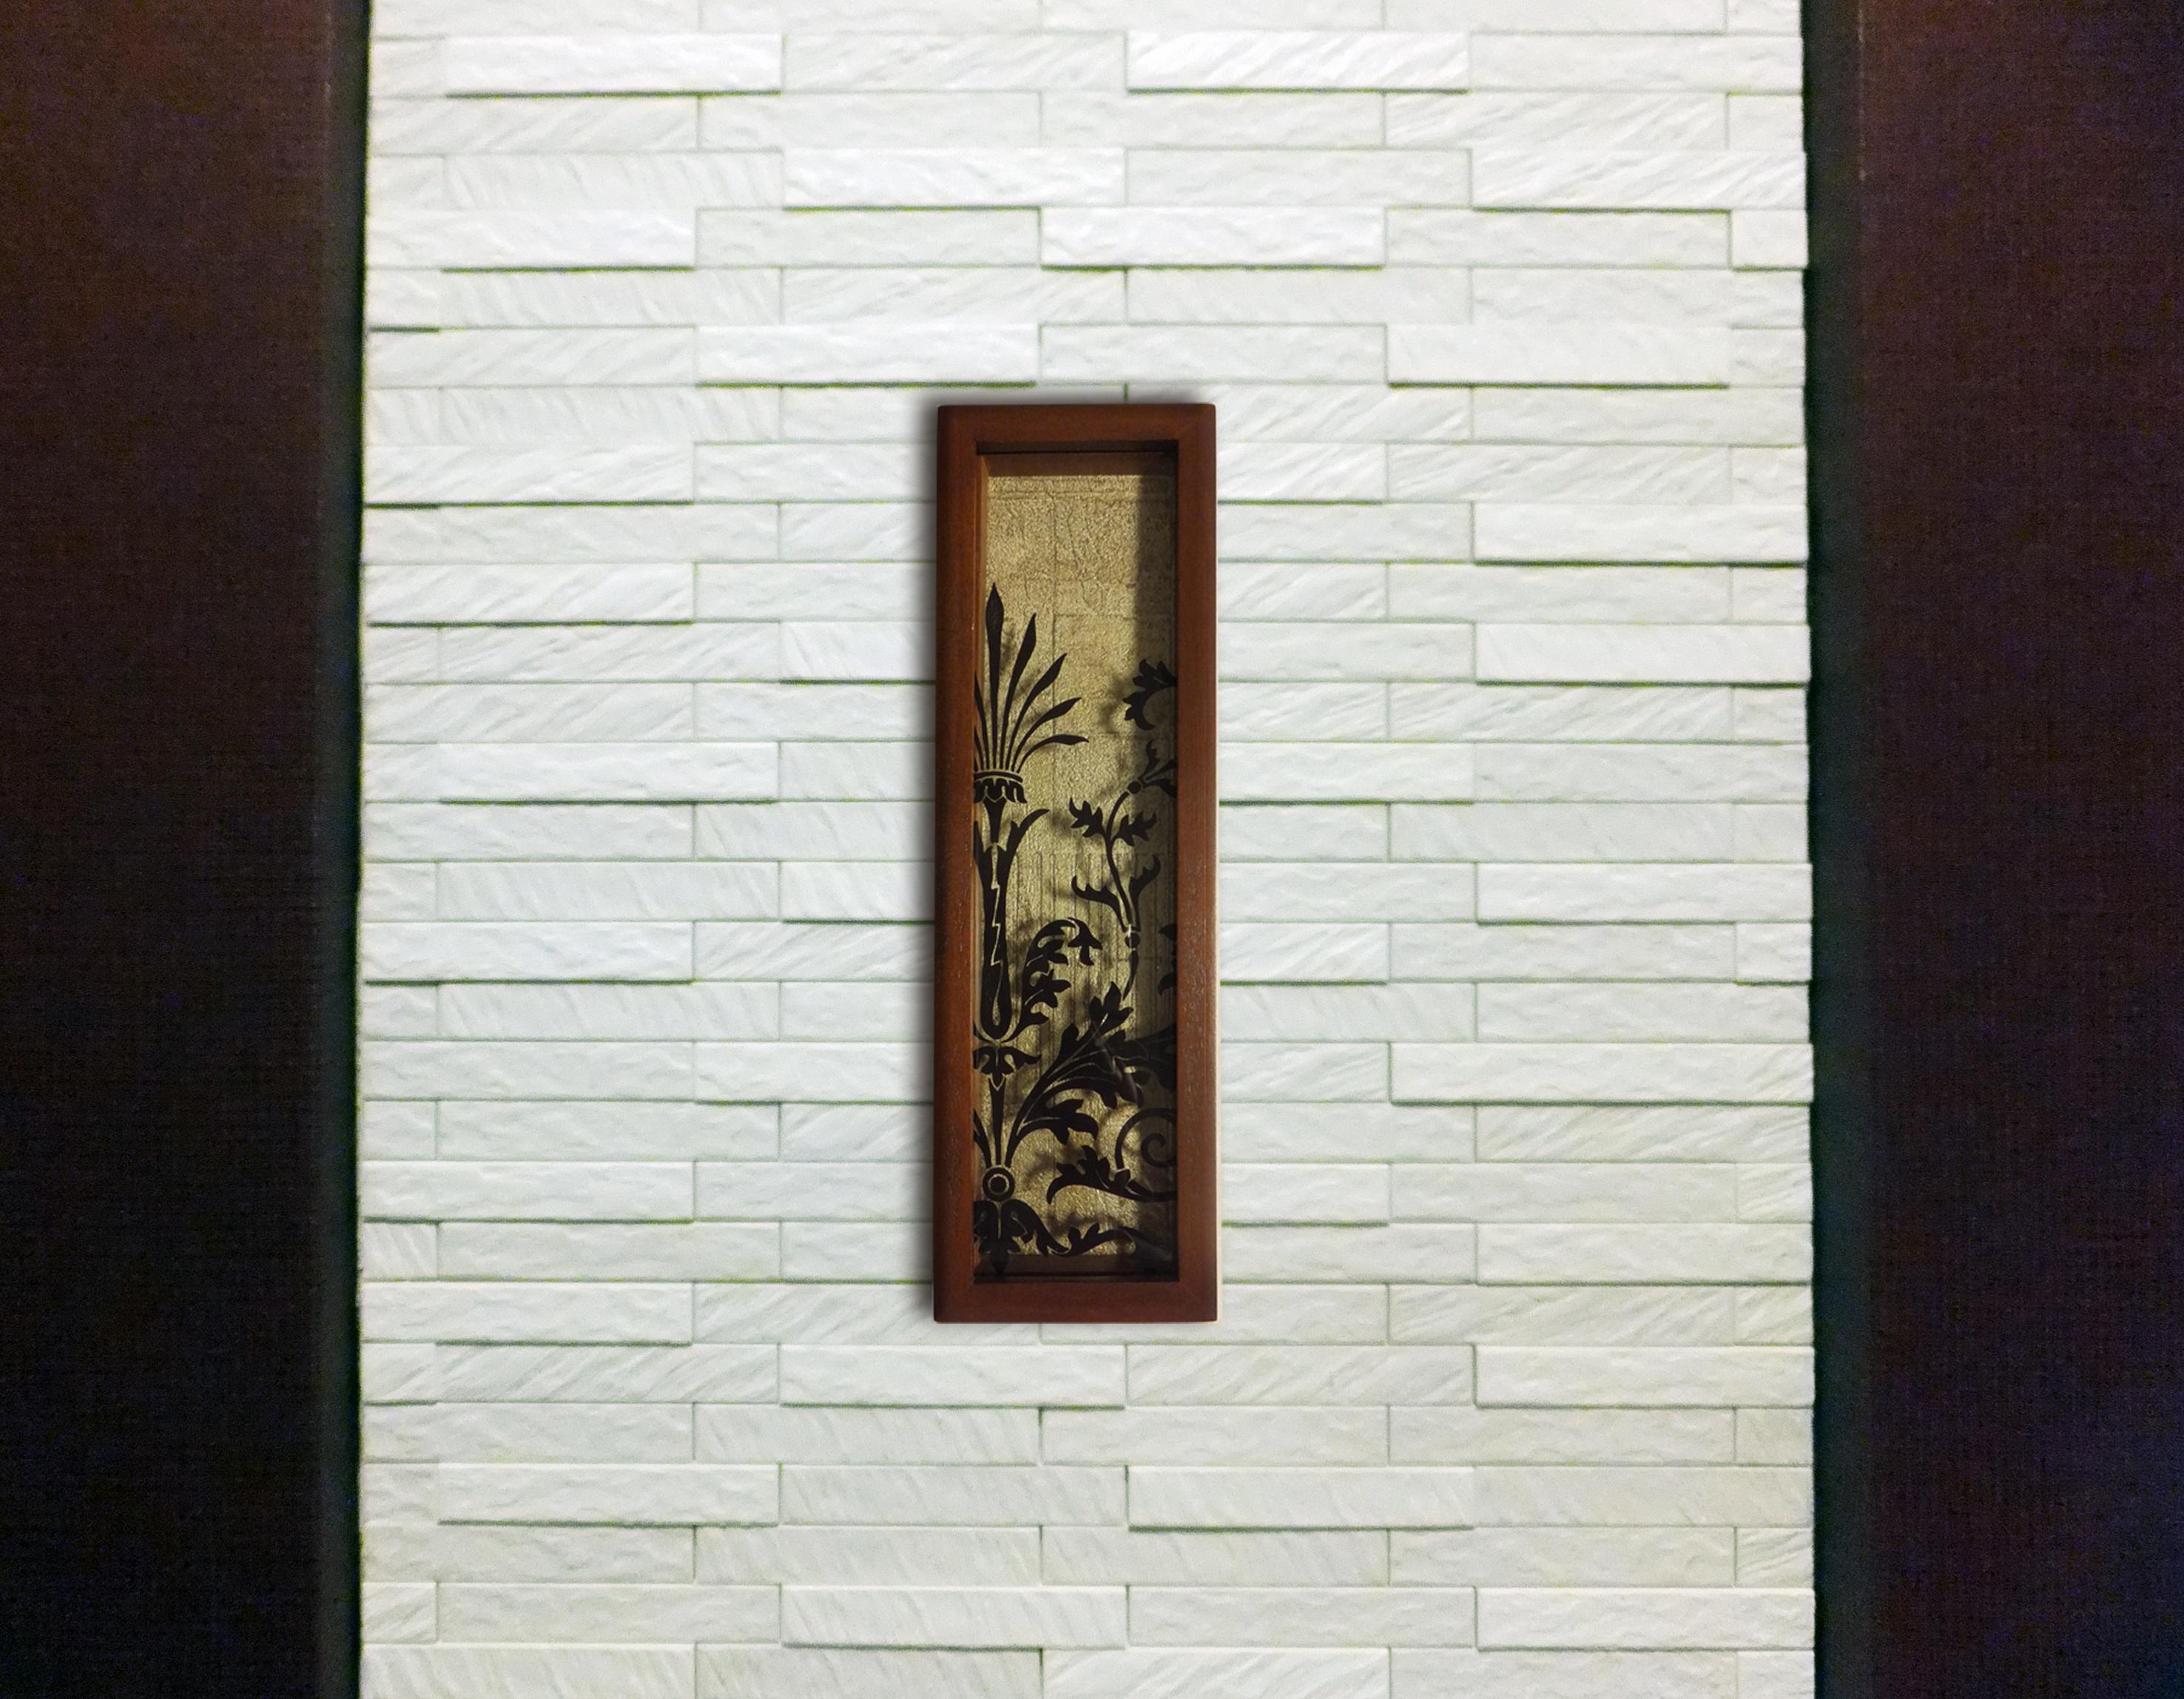 Free Images : wood, wall, lighting, door, modern, painting, interior ...